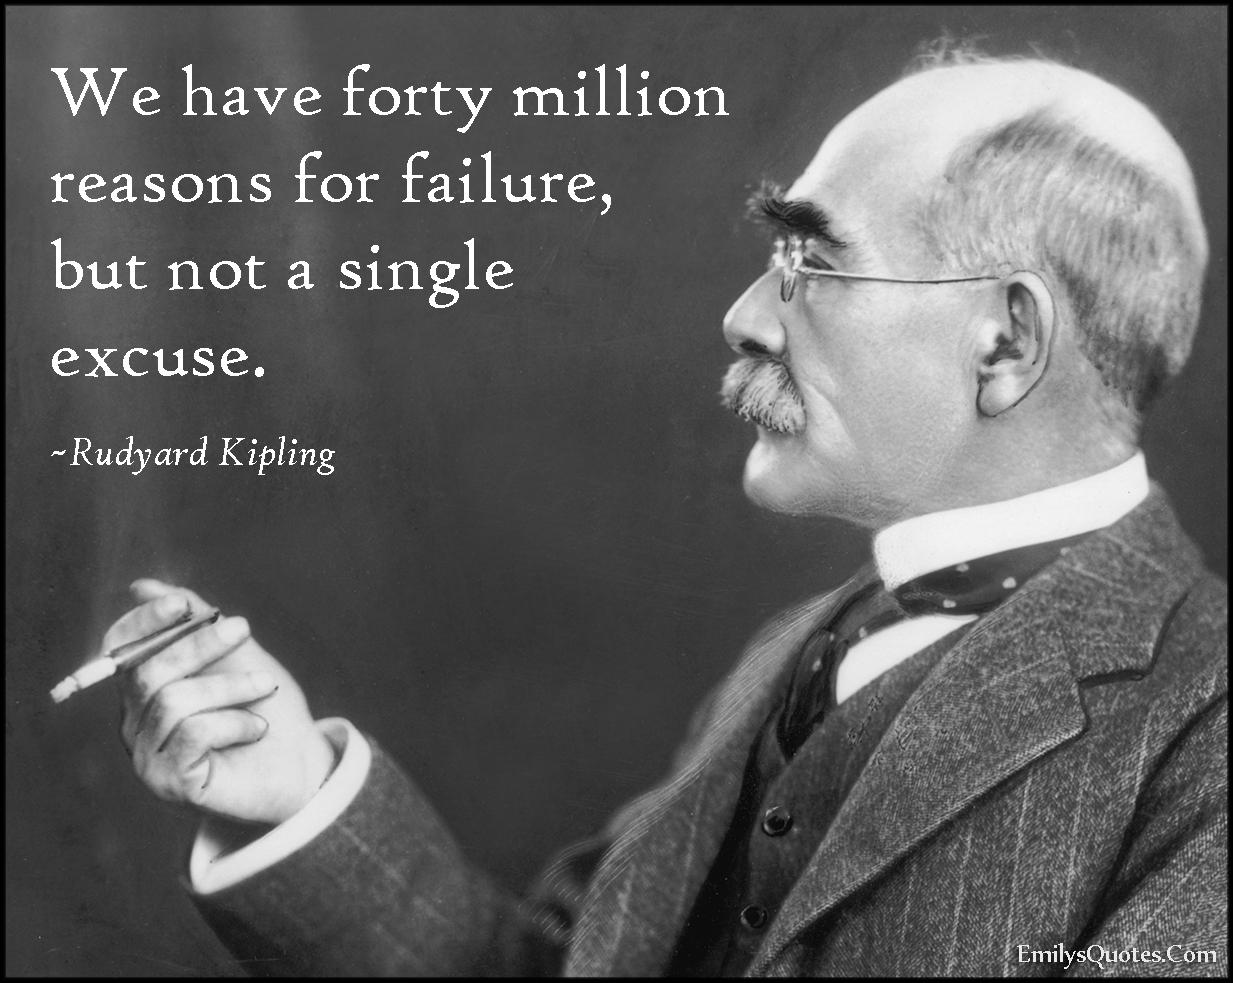 EmilysQuotes.Com - forty million, reason, failure, excuse, funny, mistake, intelligent, Rudyard Kipling